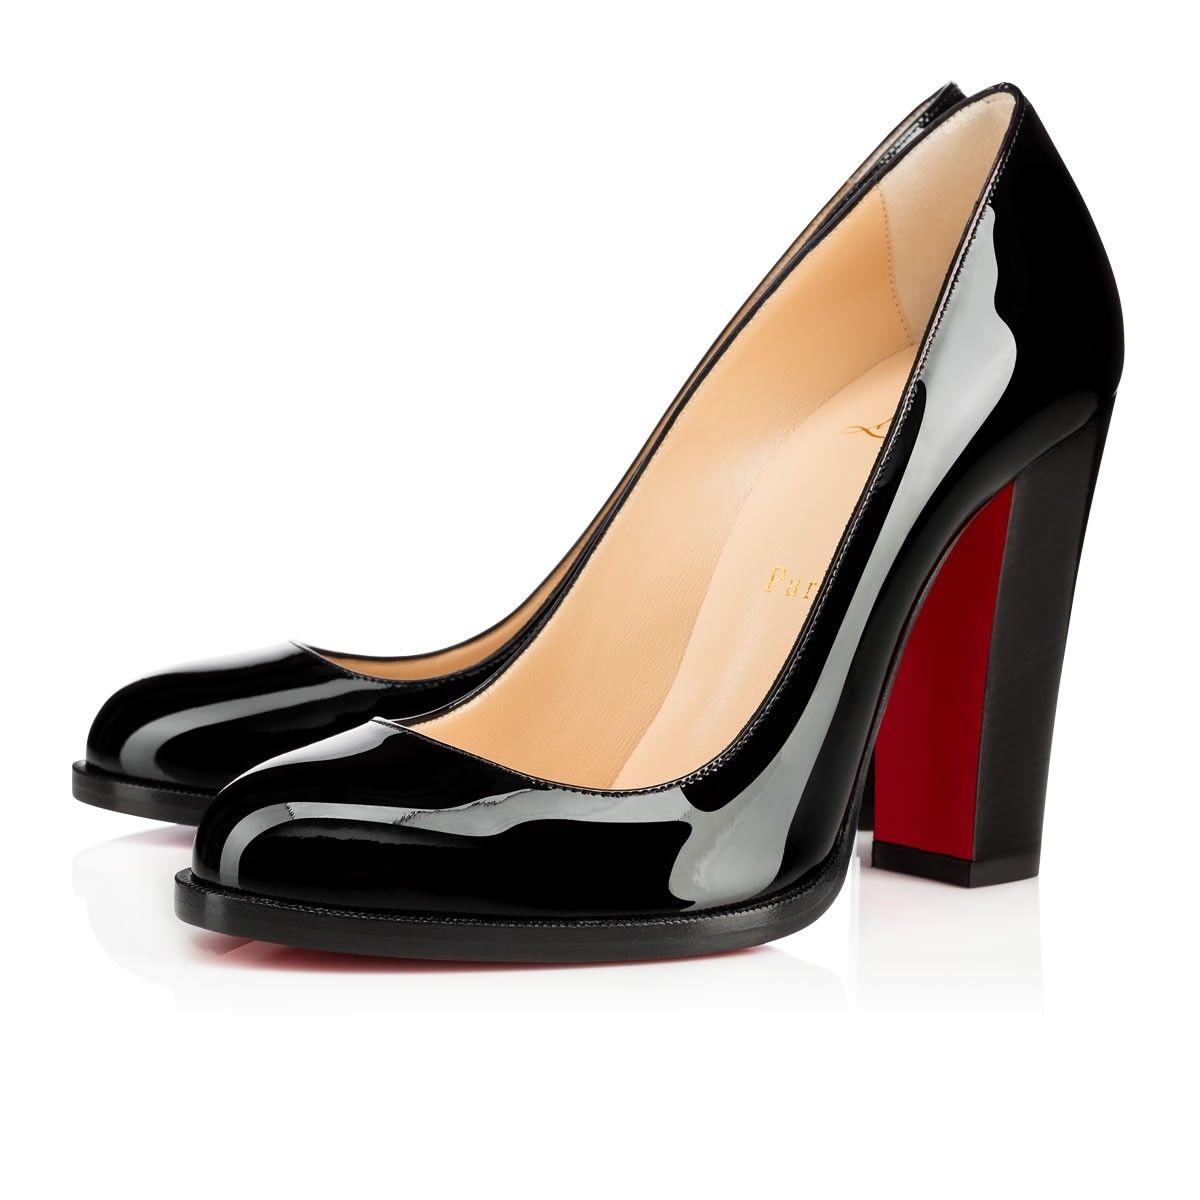 redbottomboots on Twitter. Christian Louboutin HeelsLouboutin ShoesBlack ...